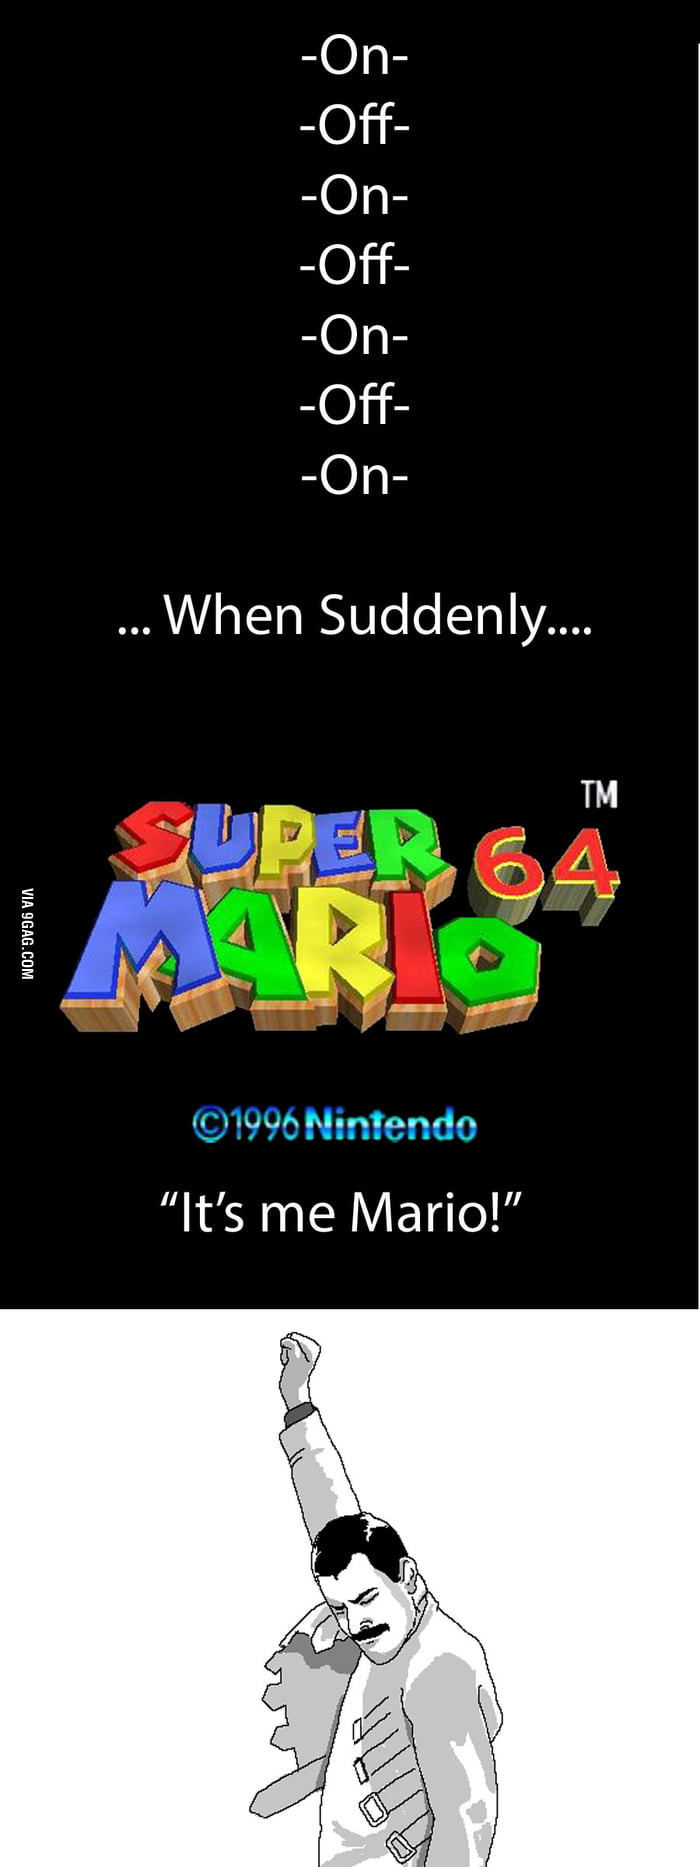 Nintendo 64 win!